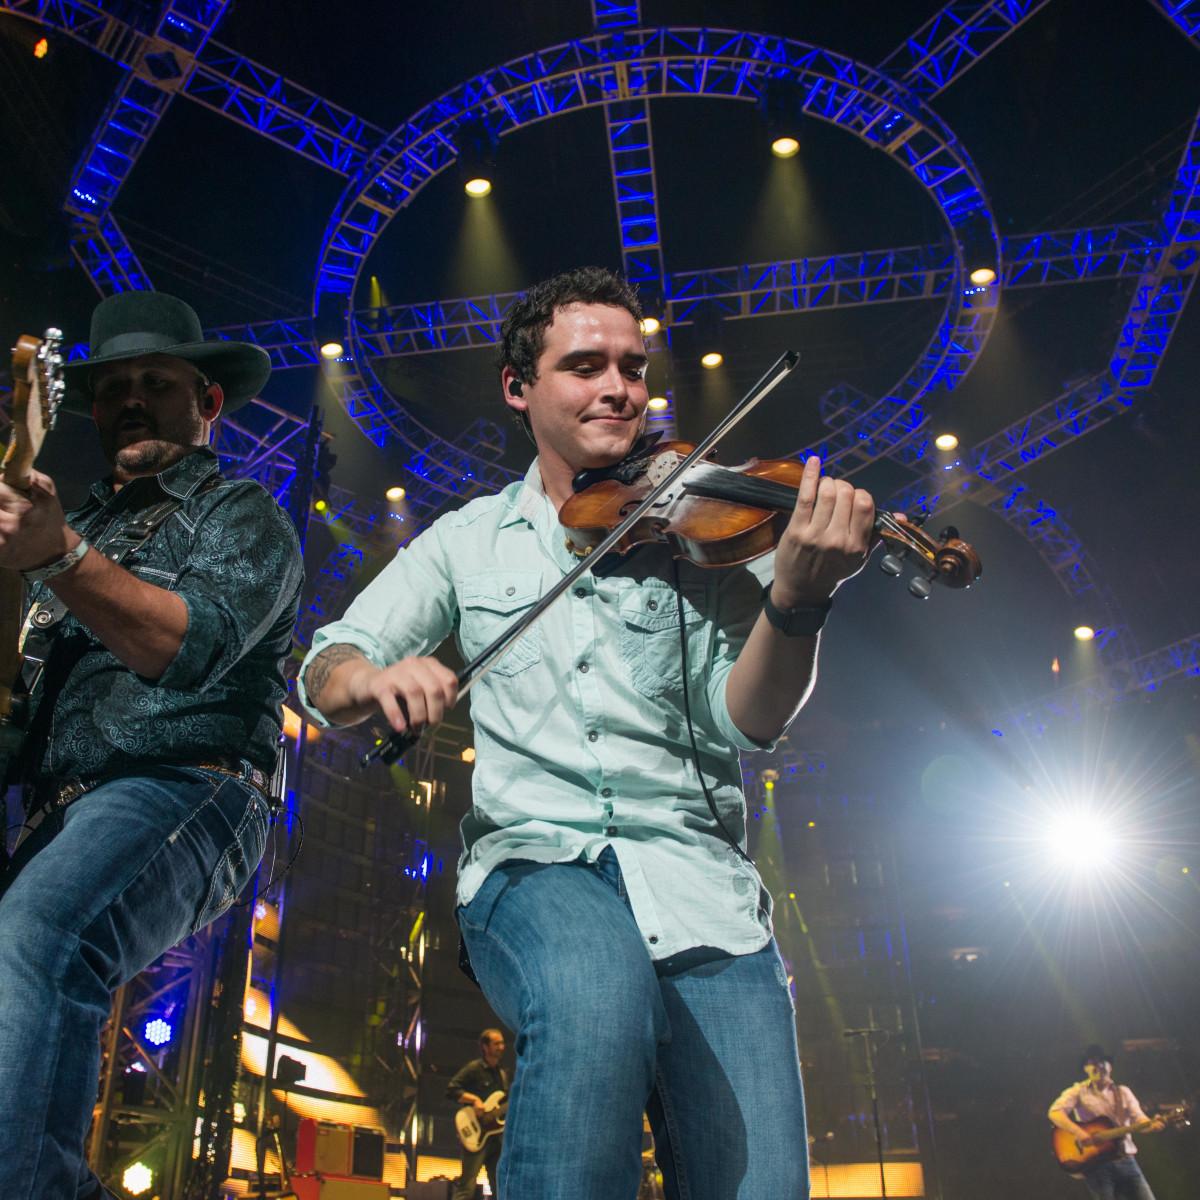 Singer turns NRG Stadium into big ol' honky tonk at Rodeo